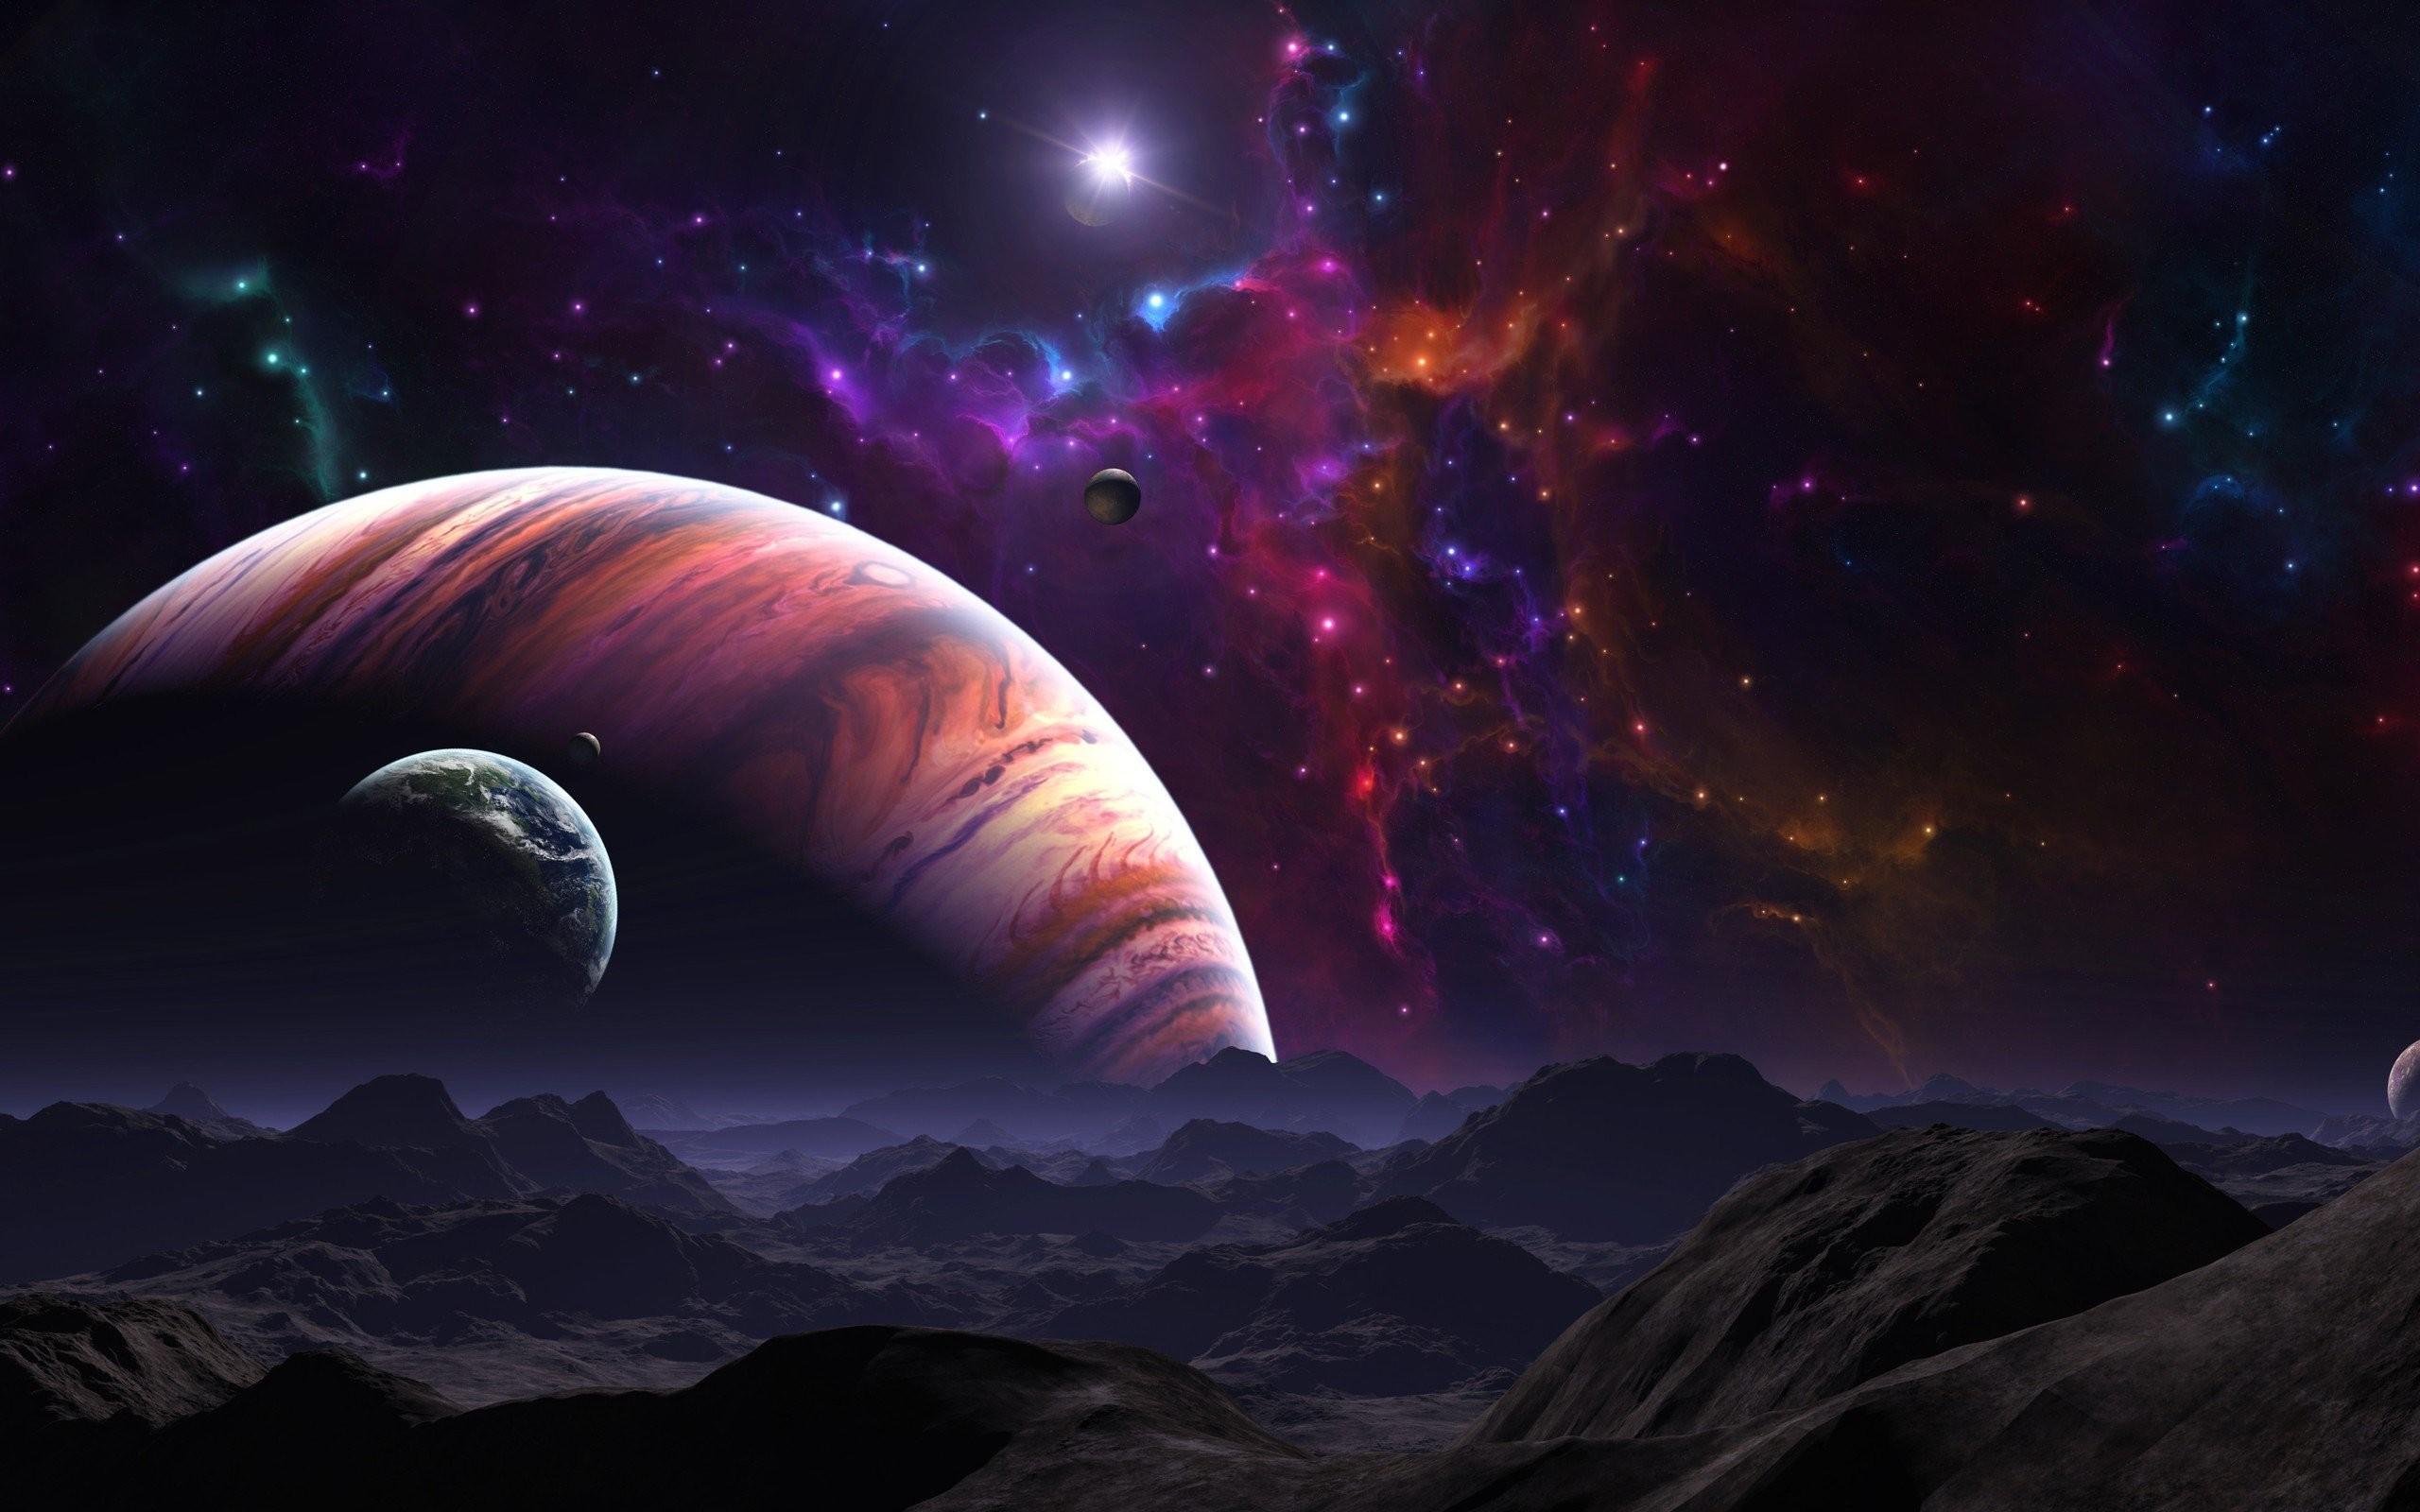 Landscapes Planets Science Fiction Fantasy Art Artwork Stars Space Nebulae  …